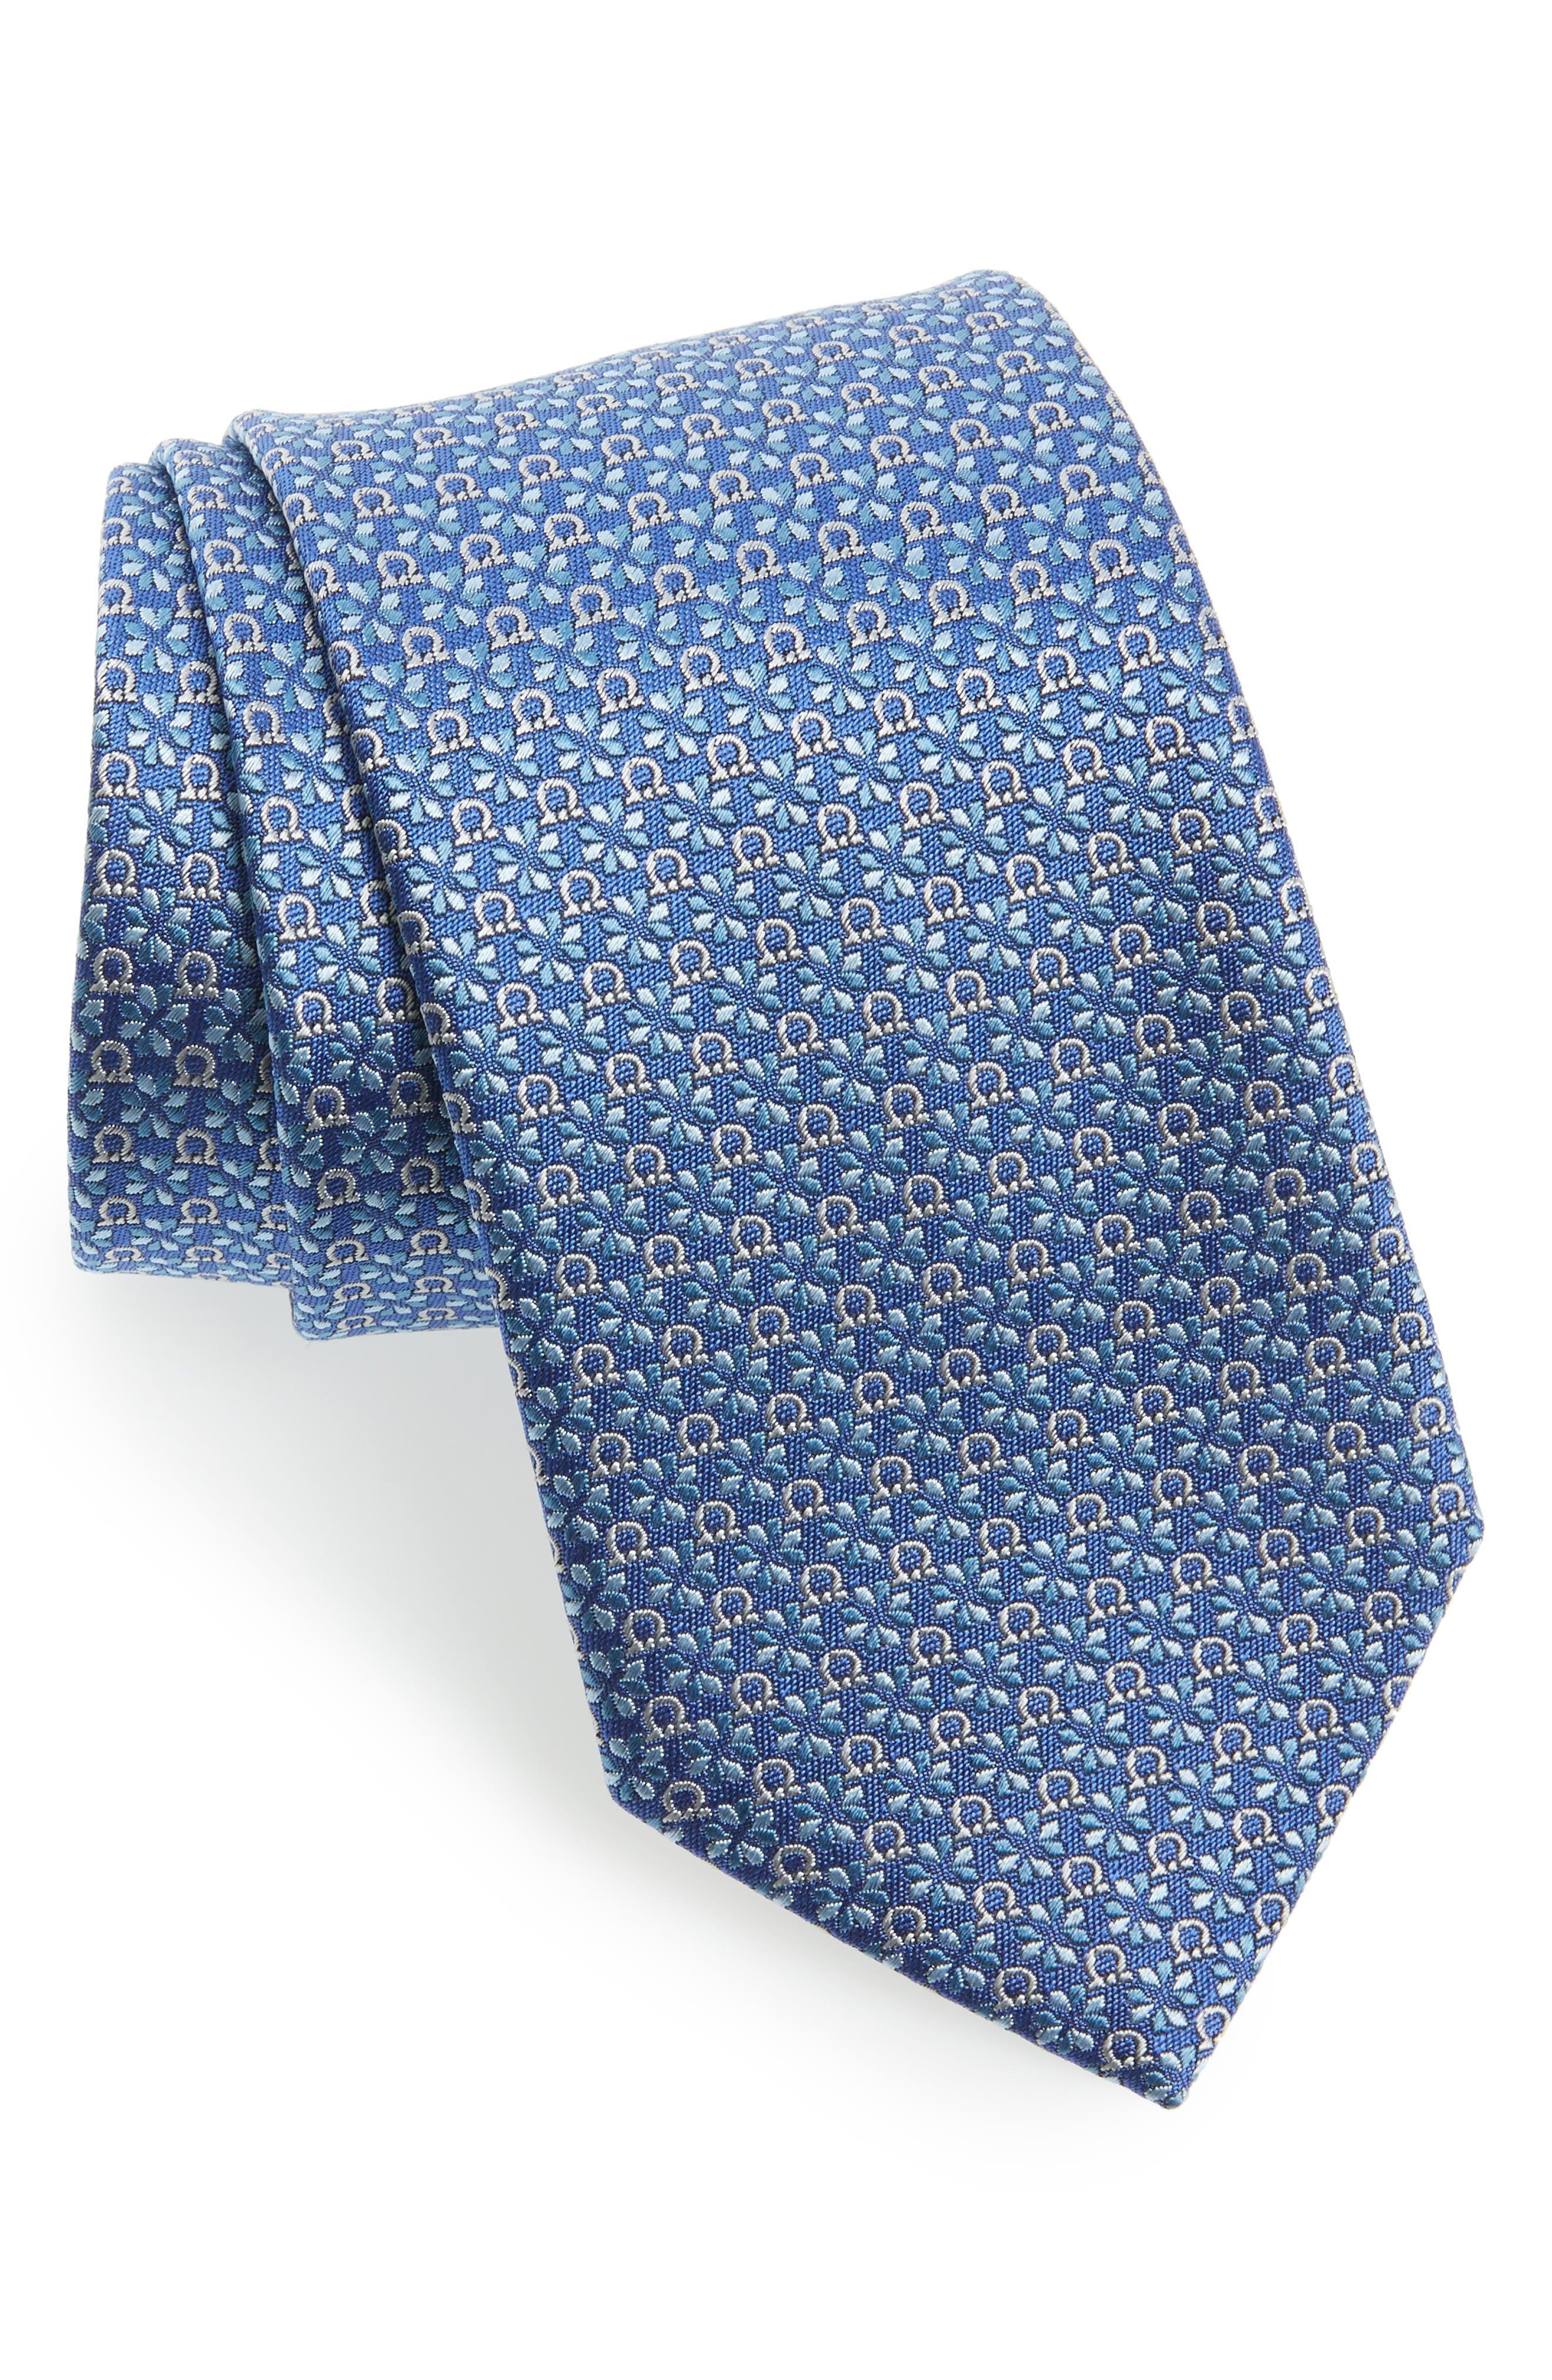 Salvatore Ferragamo Geometric Gancini & Floral Print Silk Tie